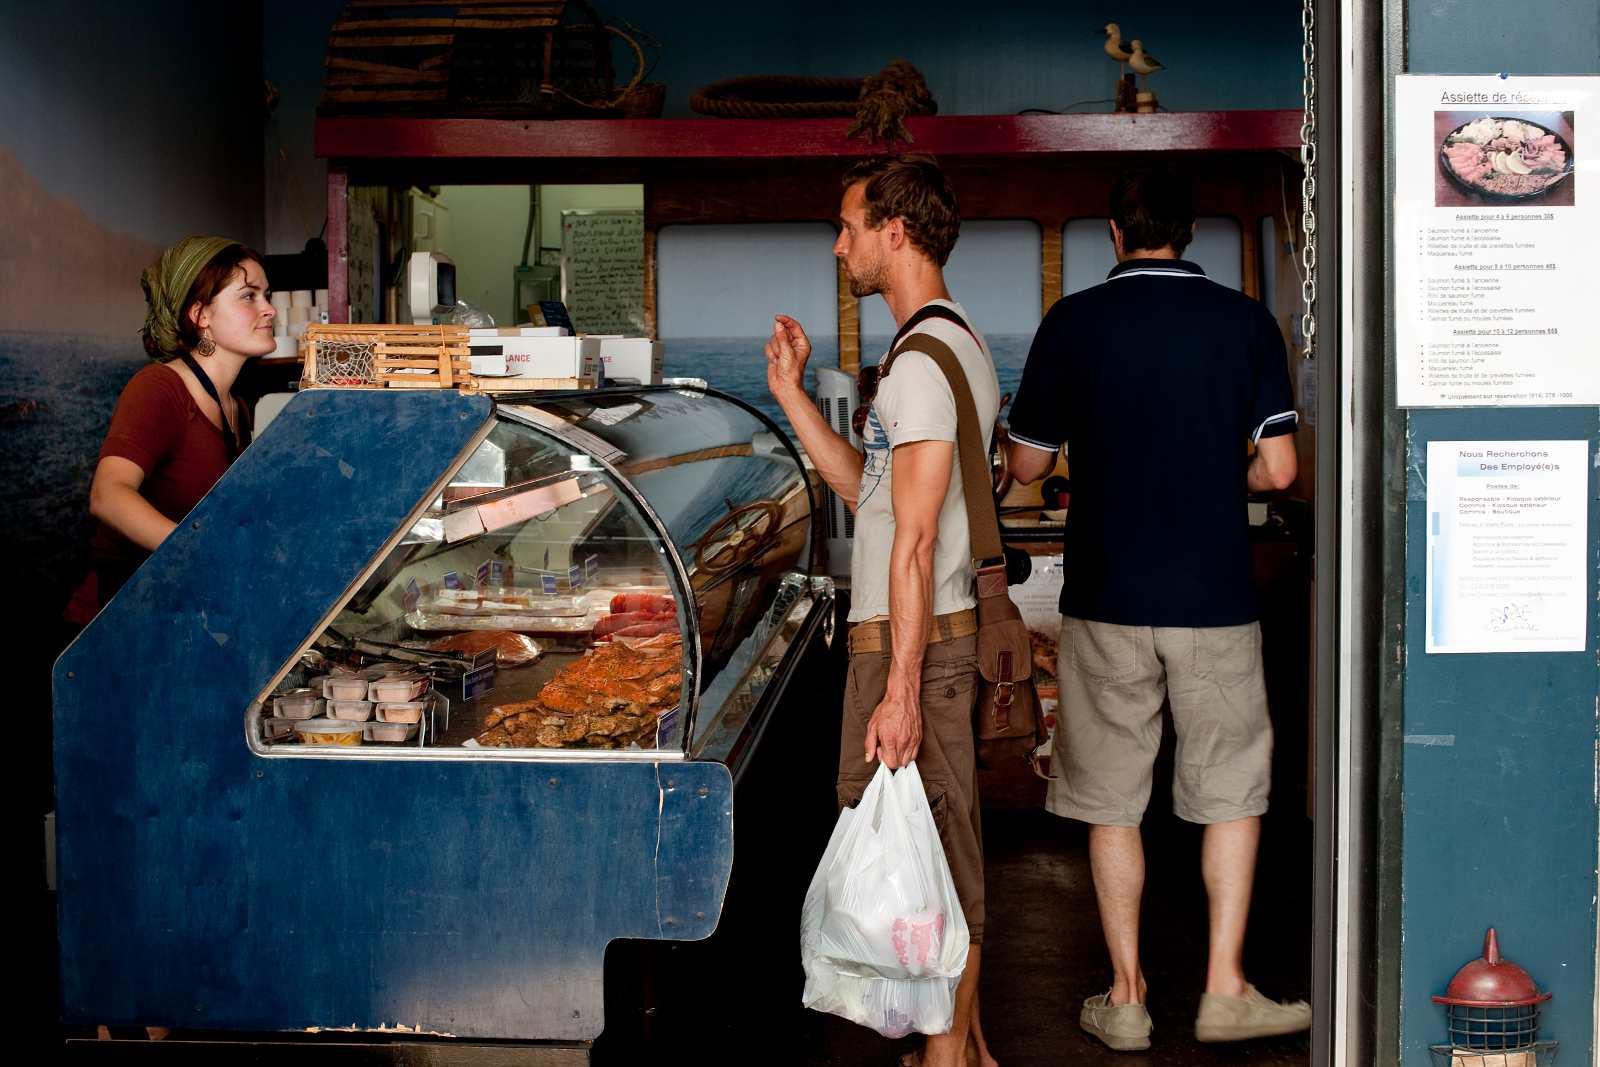 Jean-Talon Market in photos.